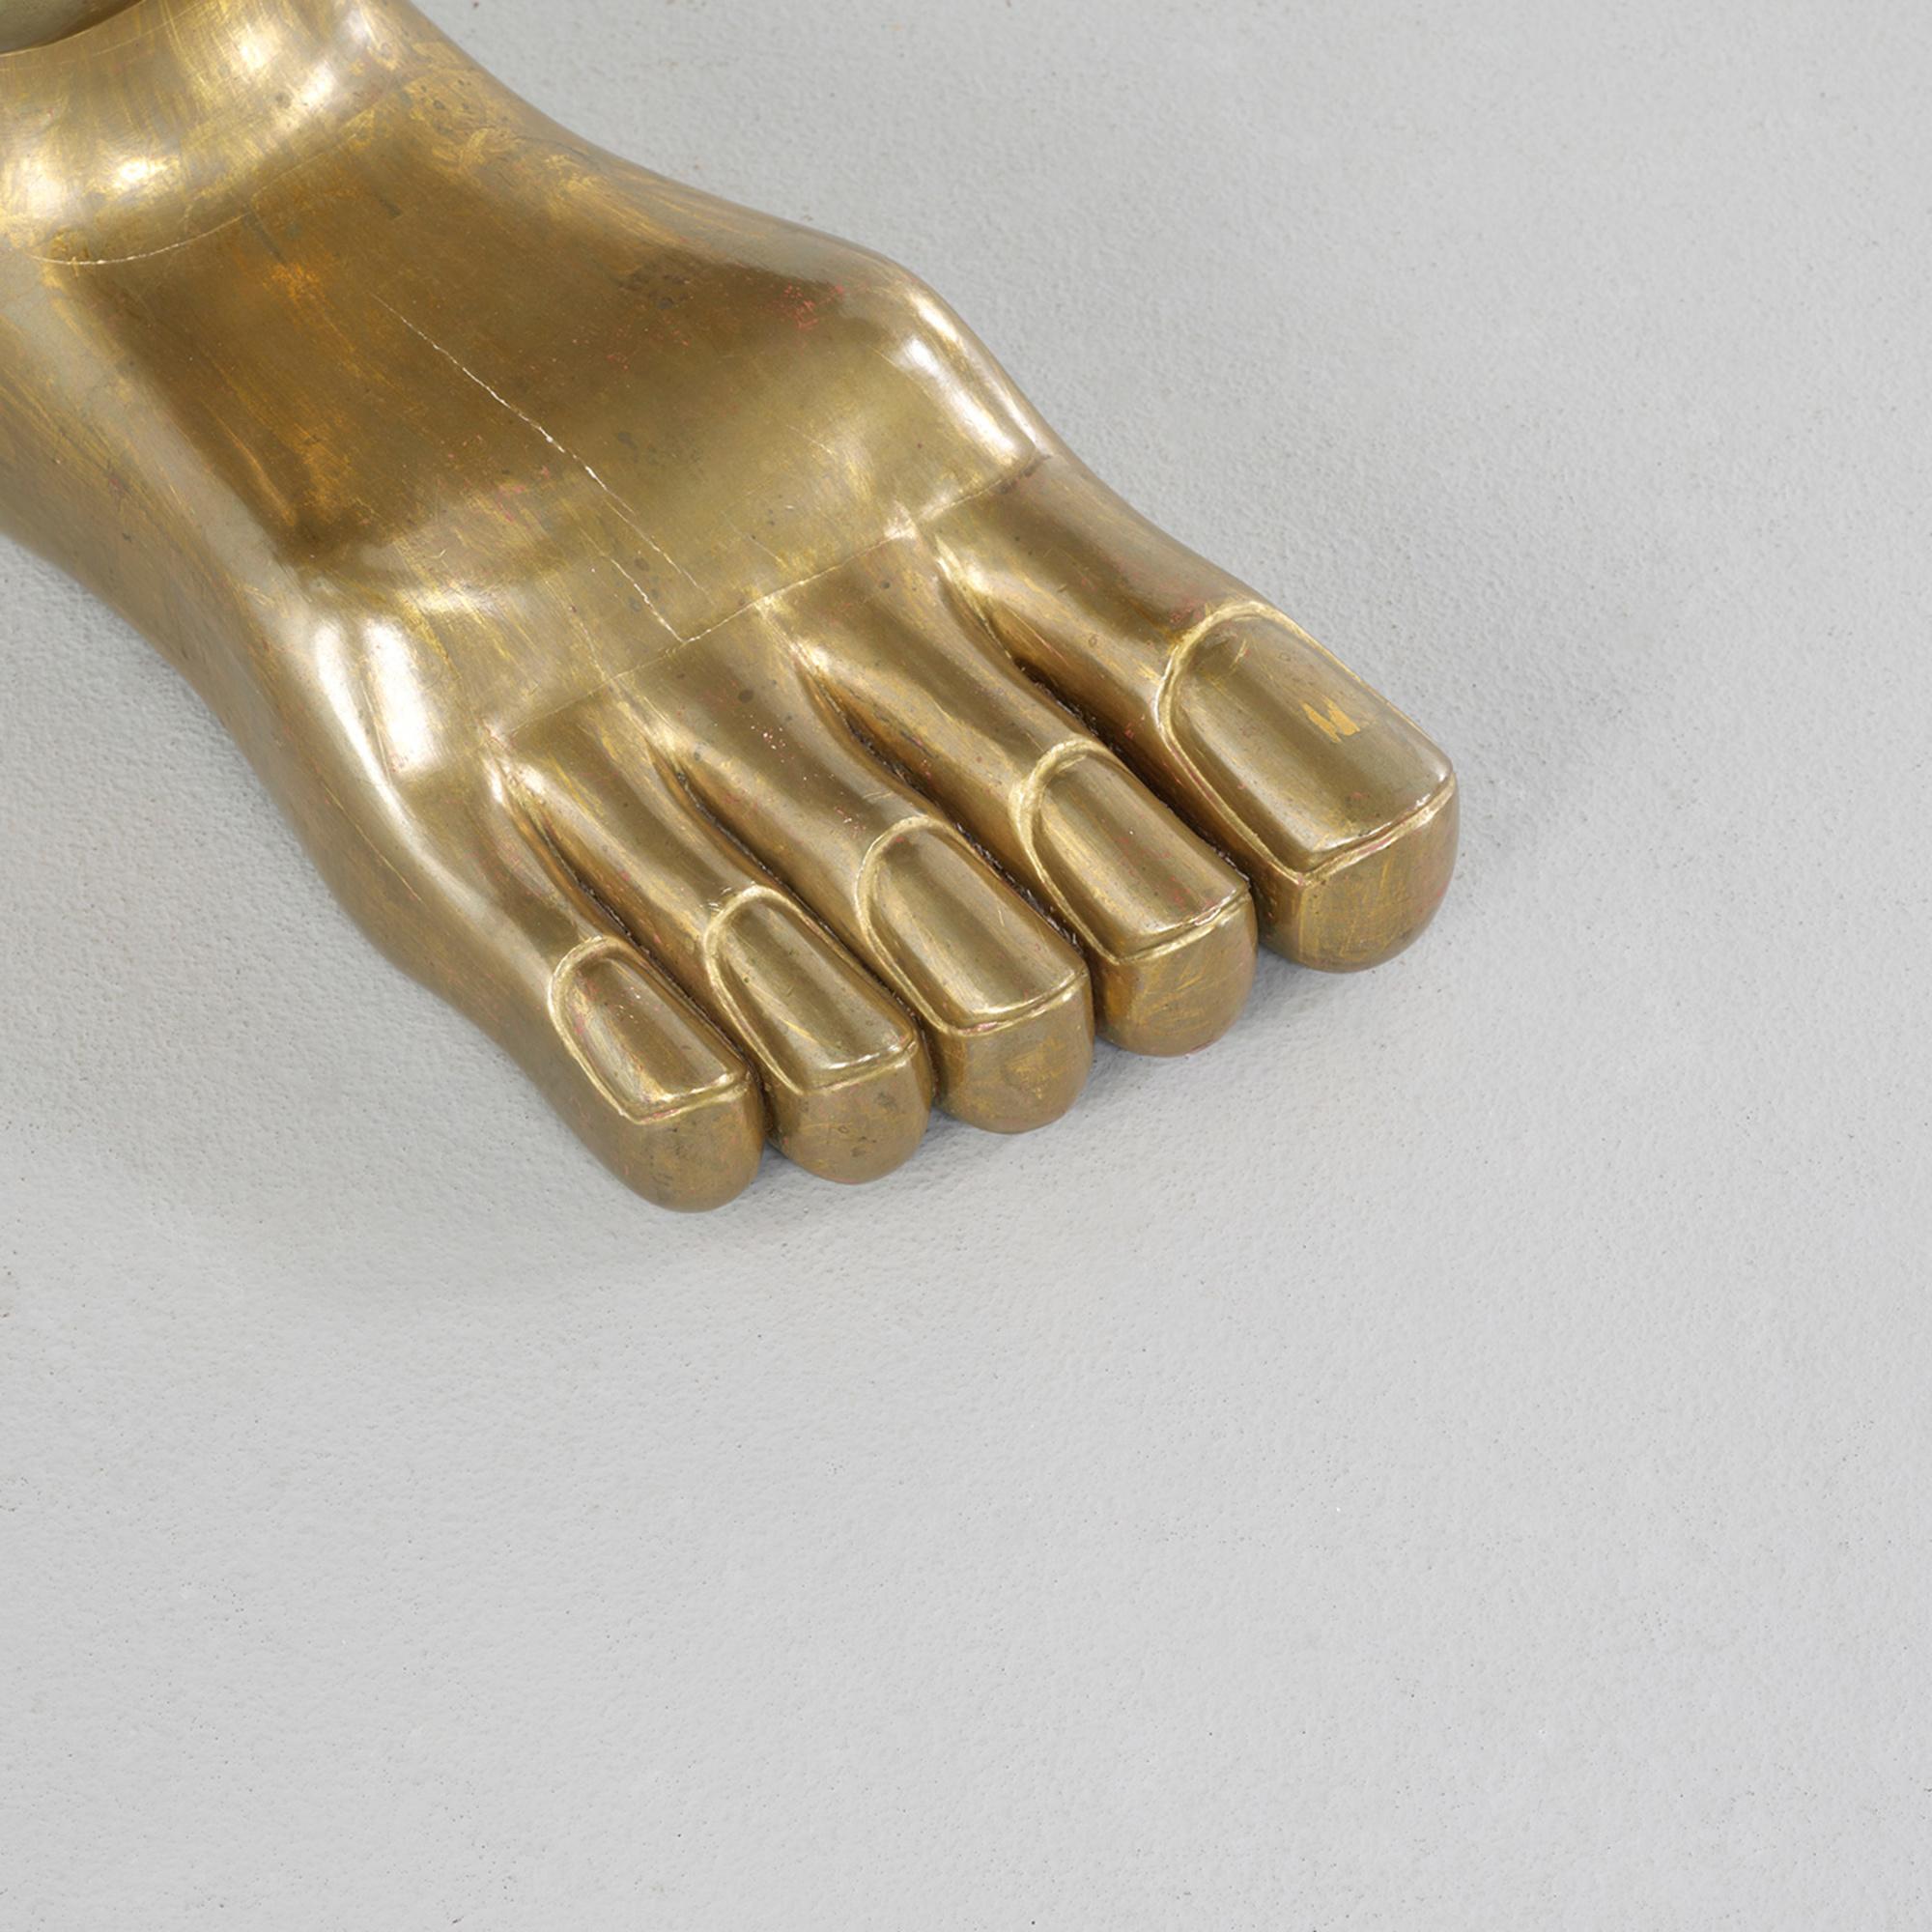 385: Pedro Friedeberg / Hand Foot chair \u003c Living Contemporary, 27 ...